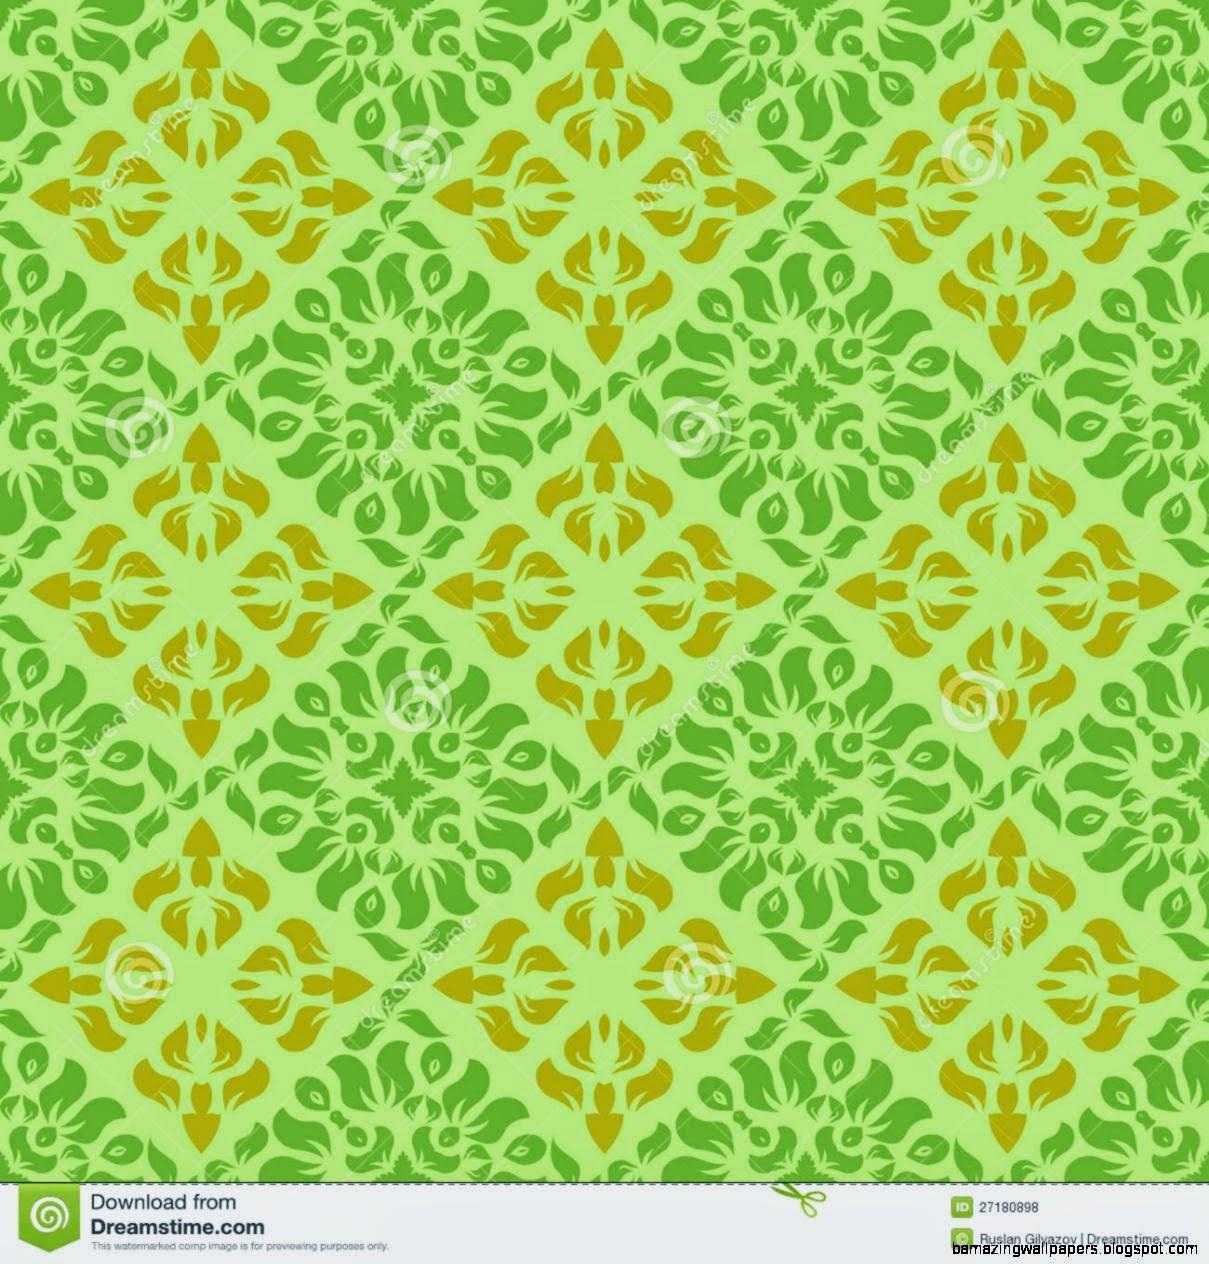 Patterned Grasscloth Wallpaper: Yellow Flower Print Wallpaper